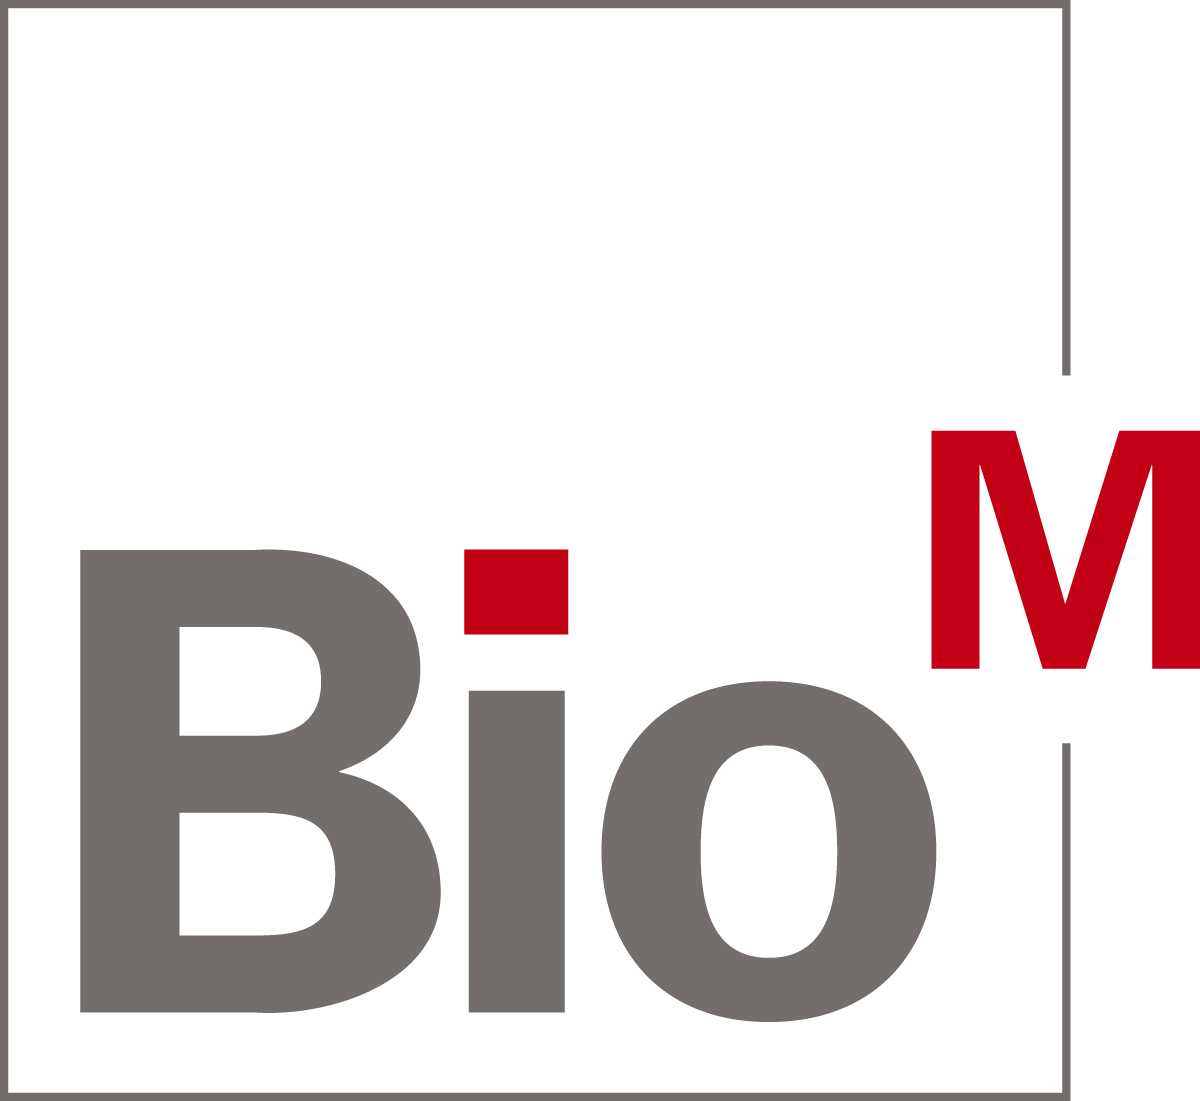 BioM Biotech Cluster Development GmbH